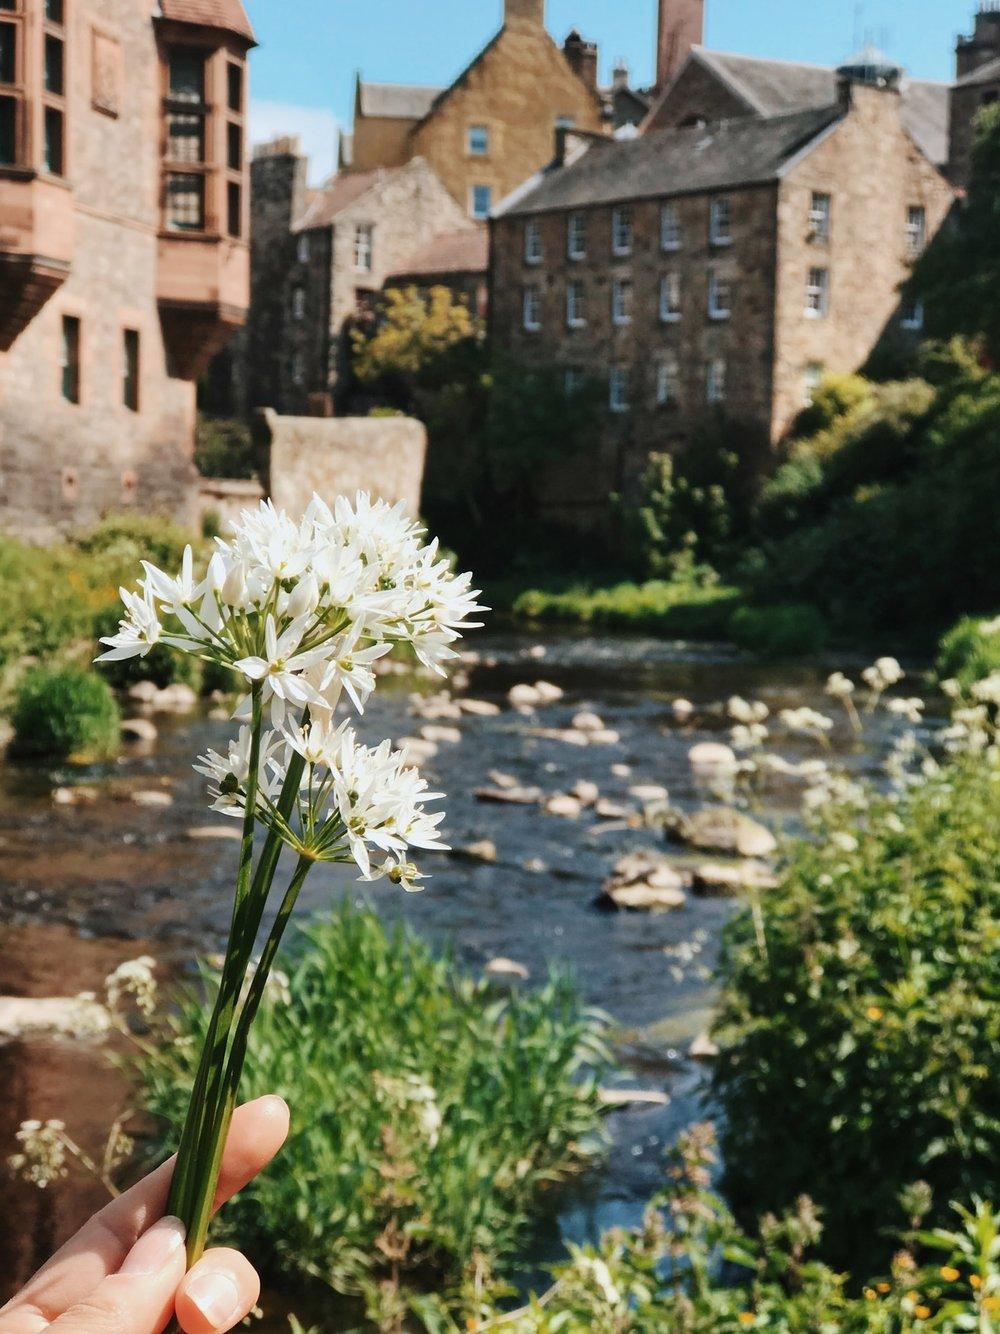 Wild garlic foraged by the Water of Leith, Edinburgh